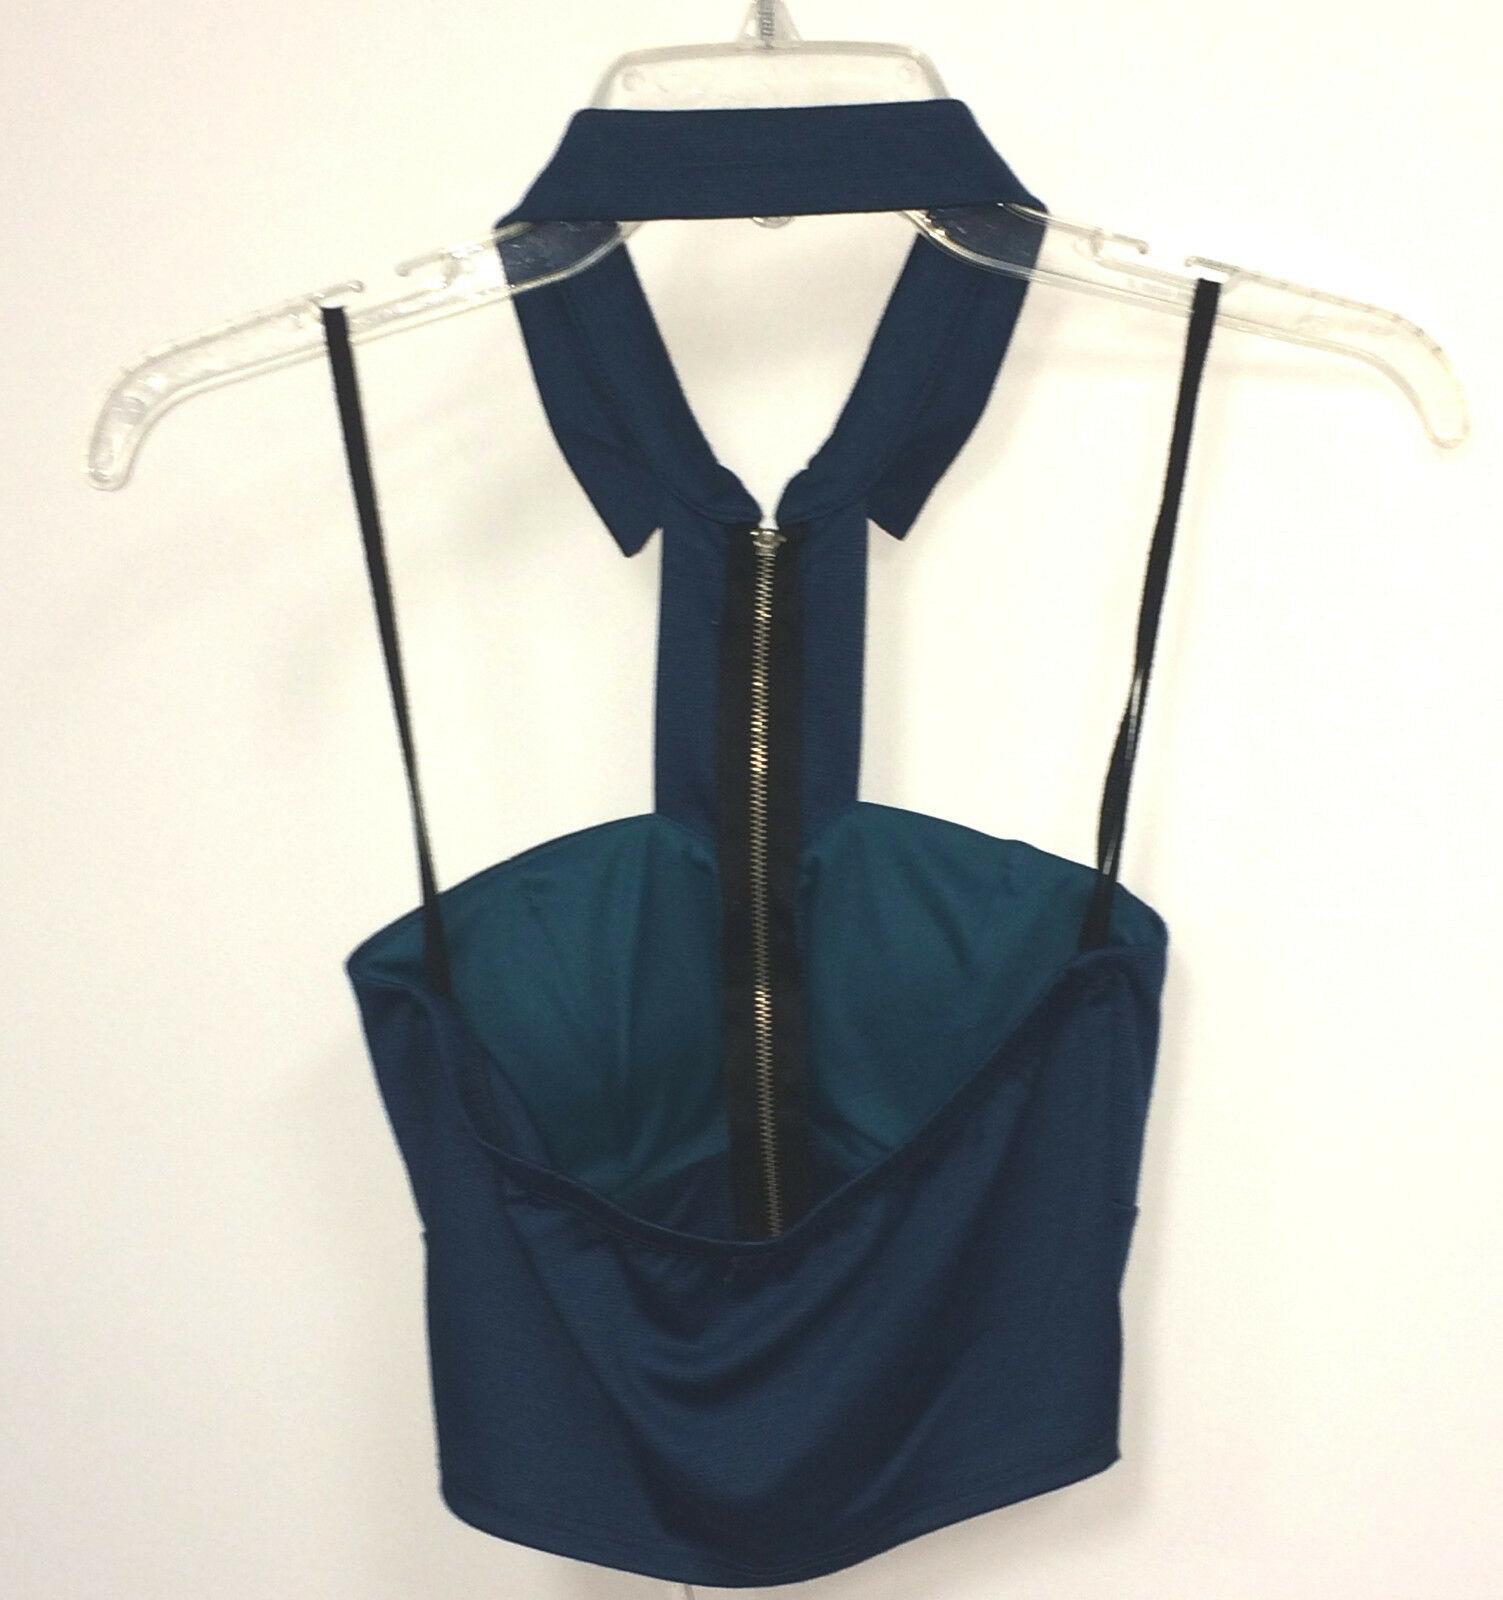 NEW B Envied Blue Cut Out Zipper Collar Sleeveless Padded Bra Cup Crop Top